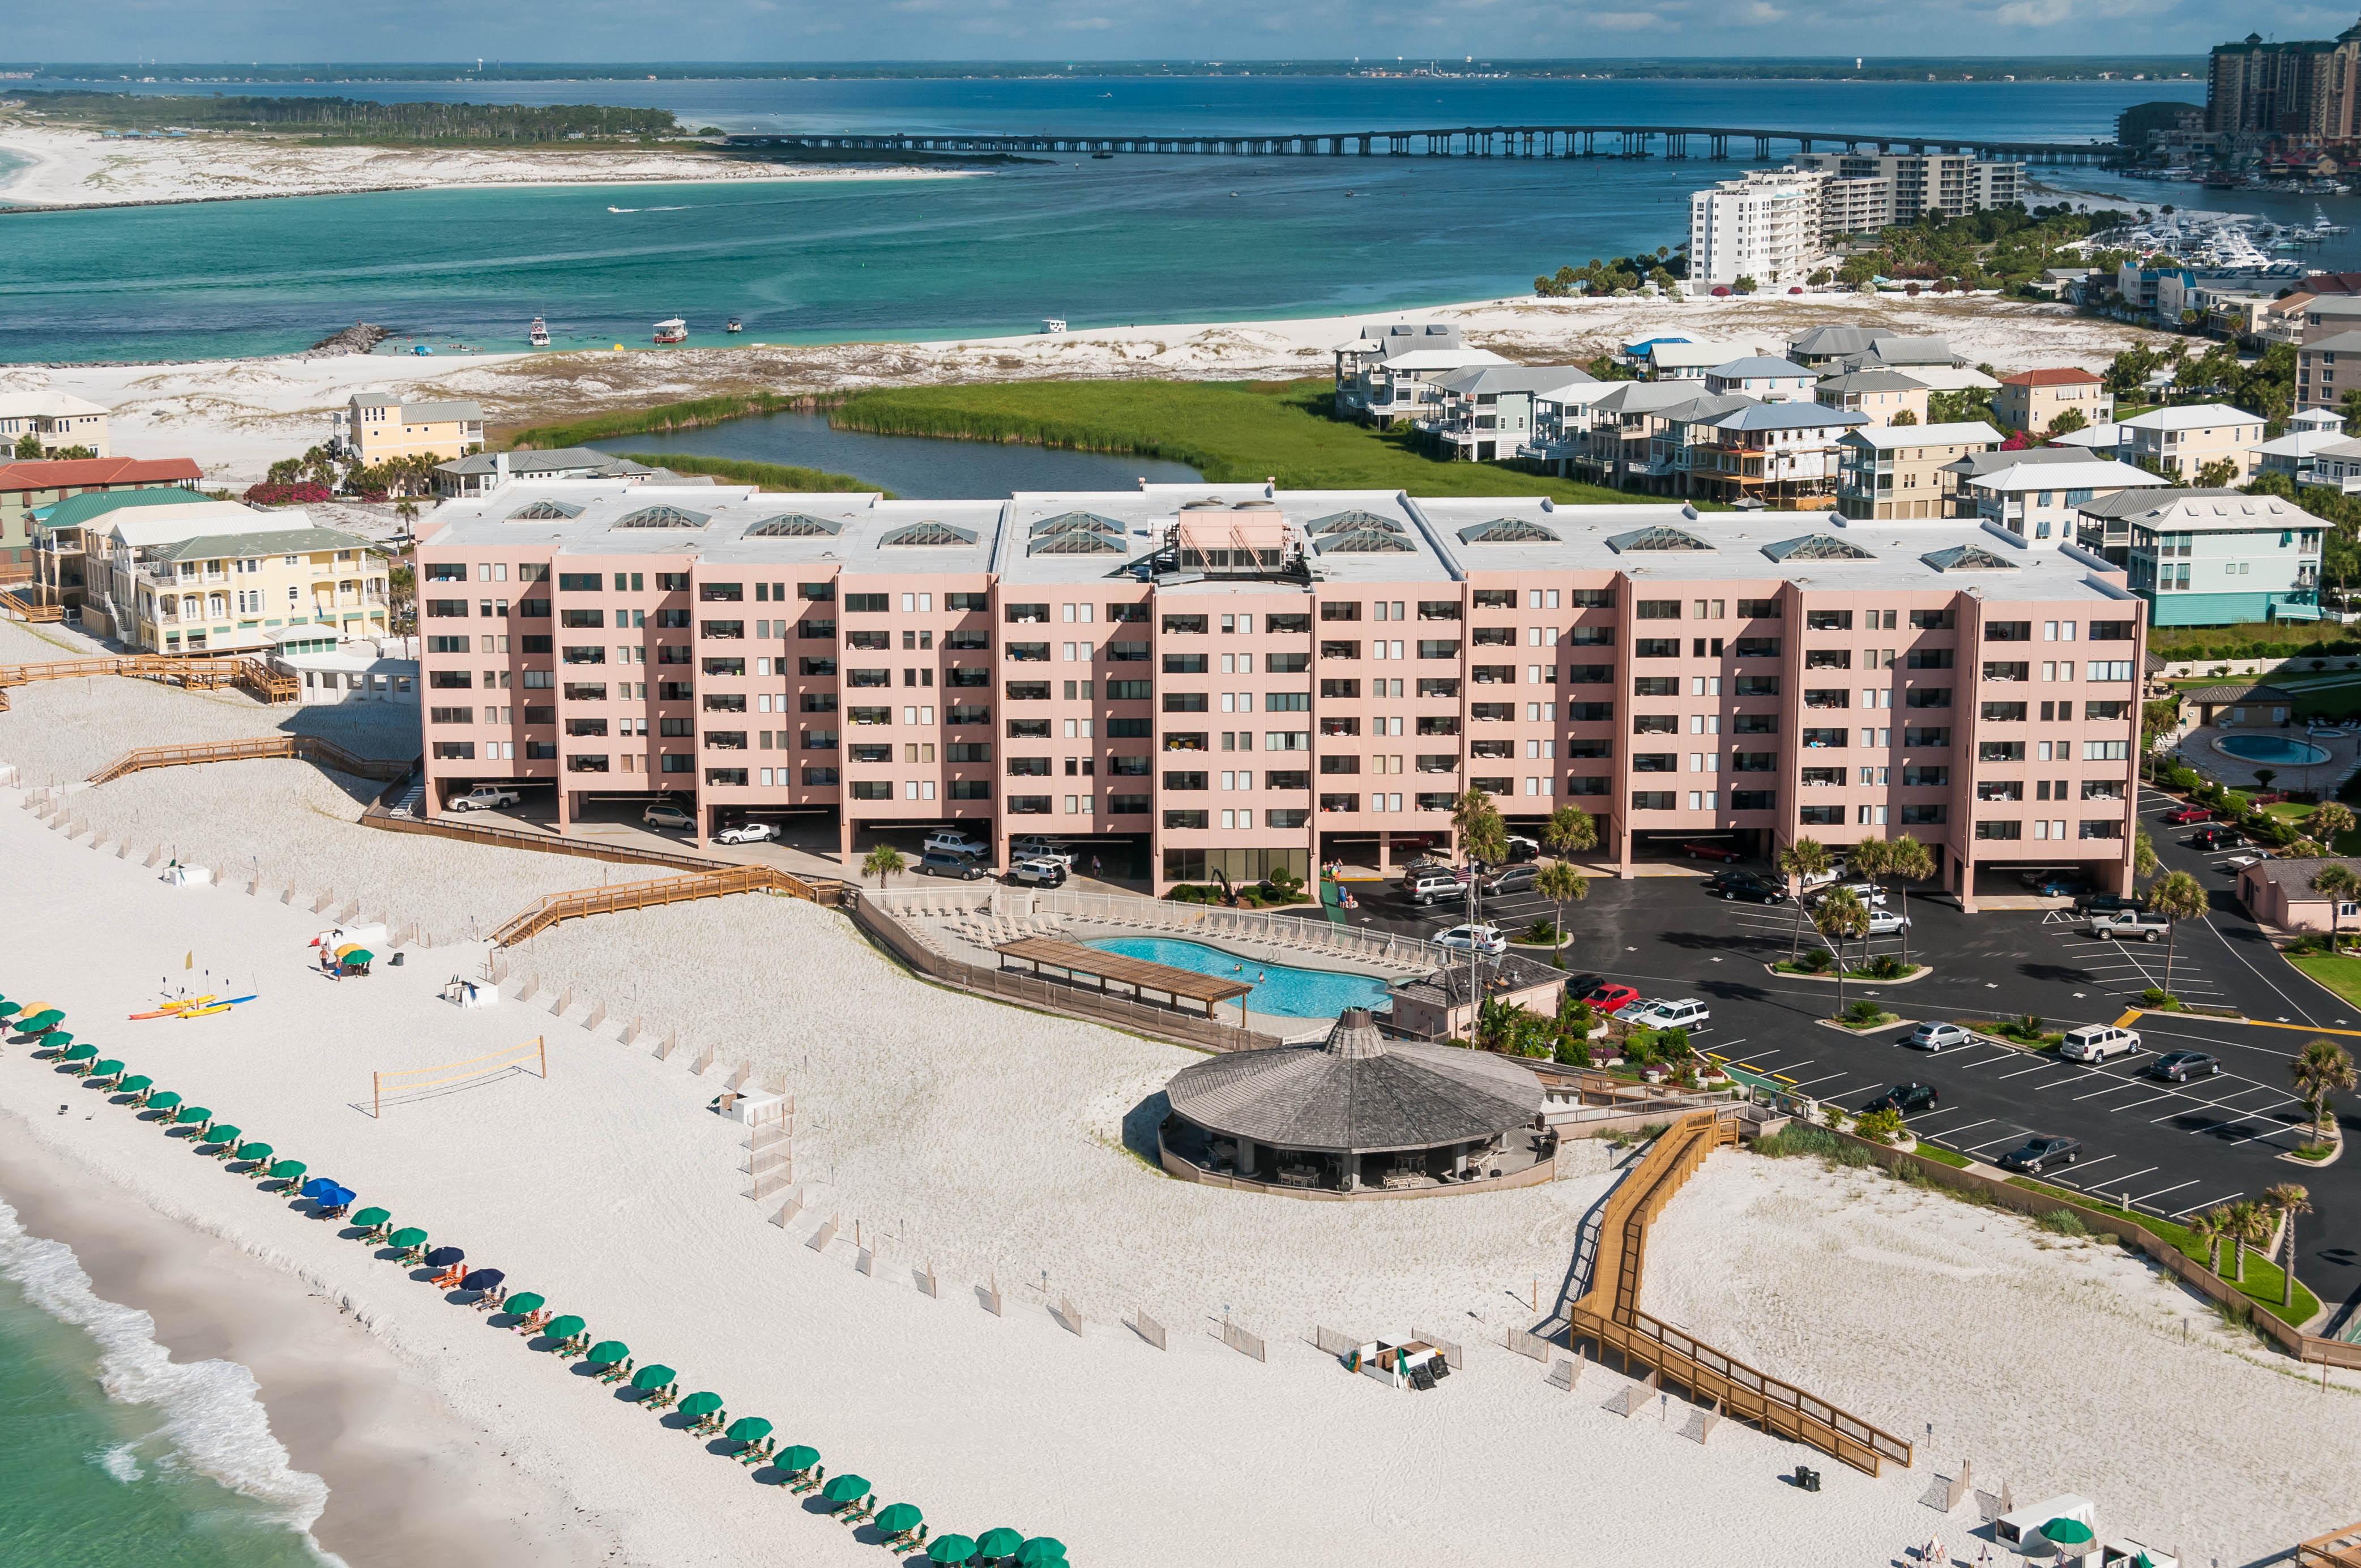 Jetty East Condominiums in Destin, FL